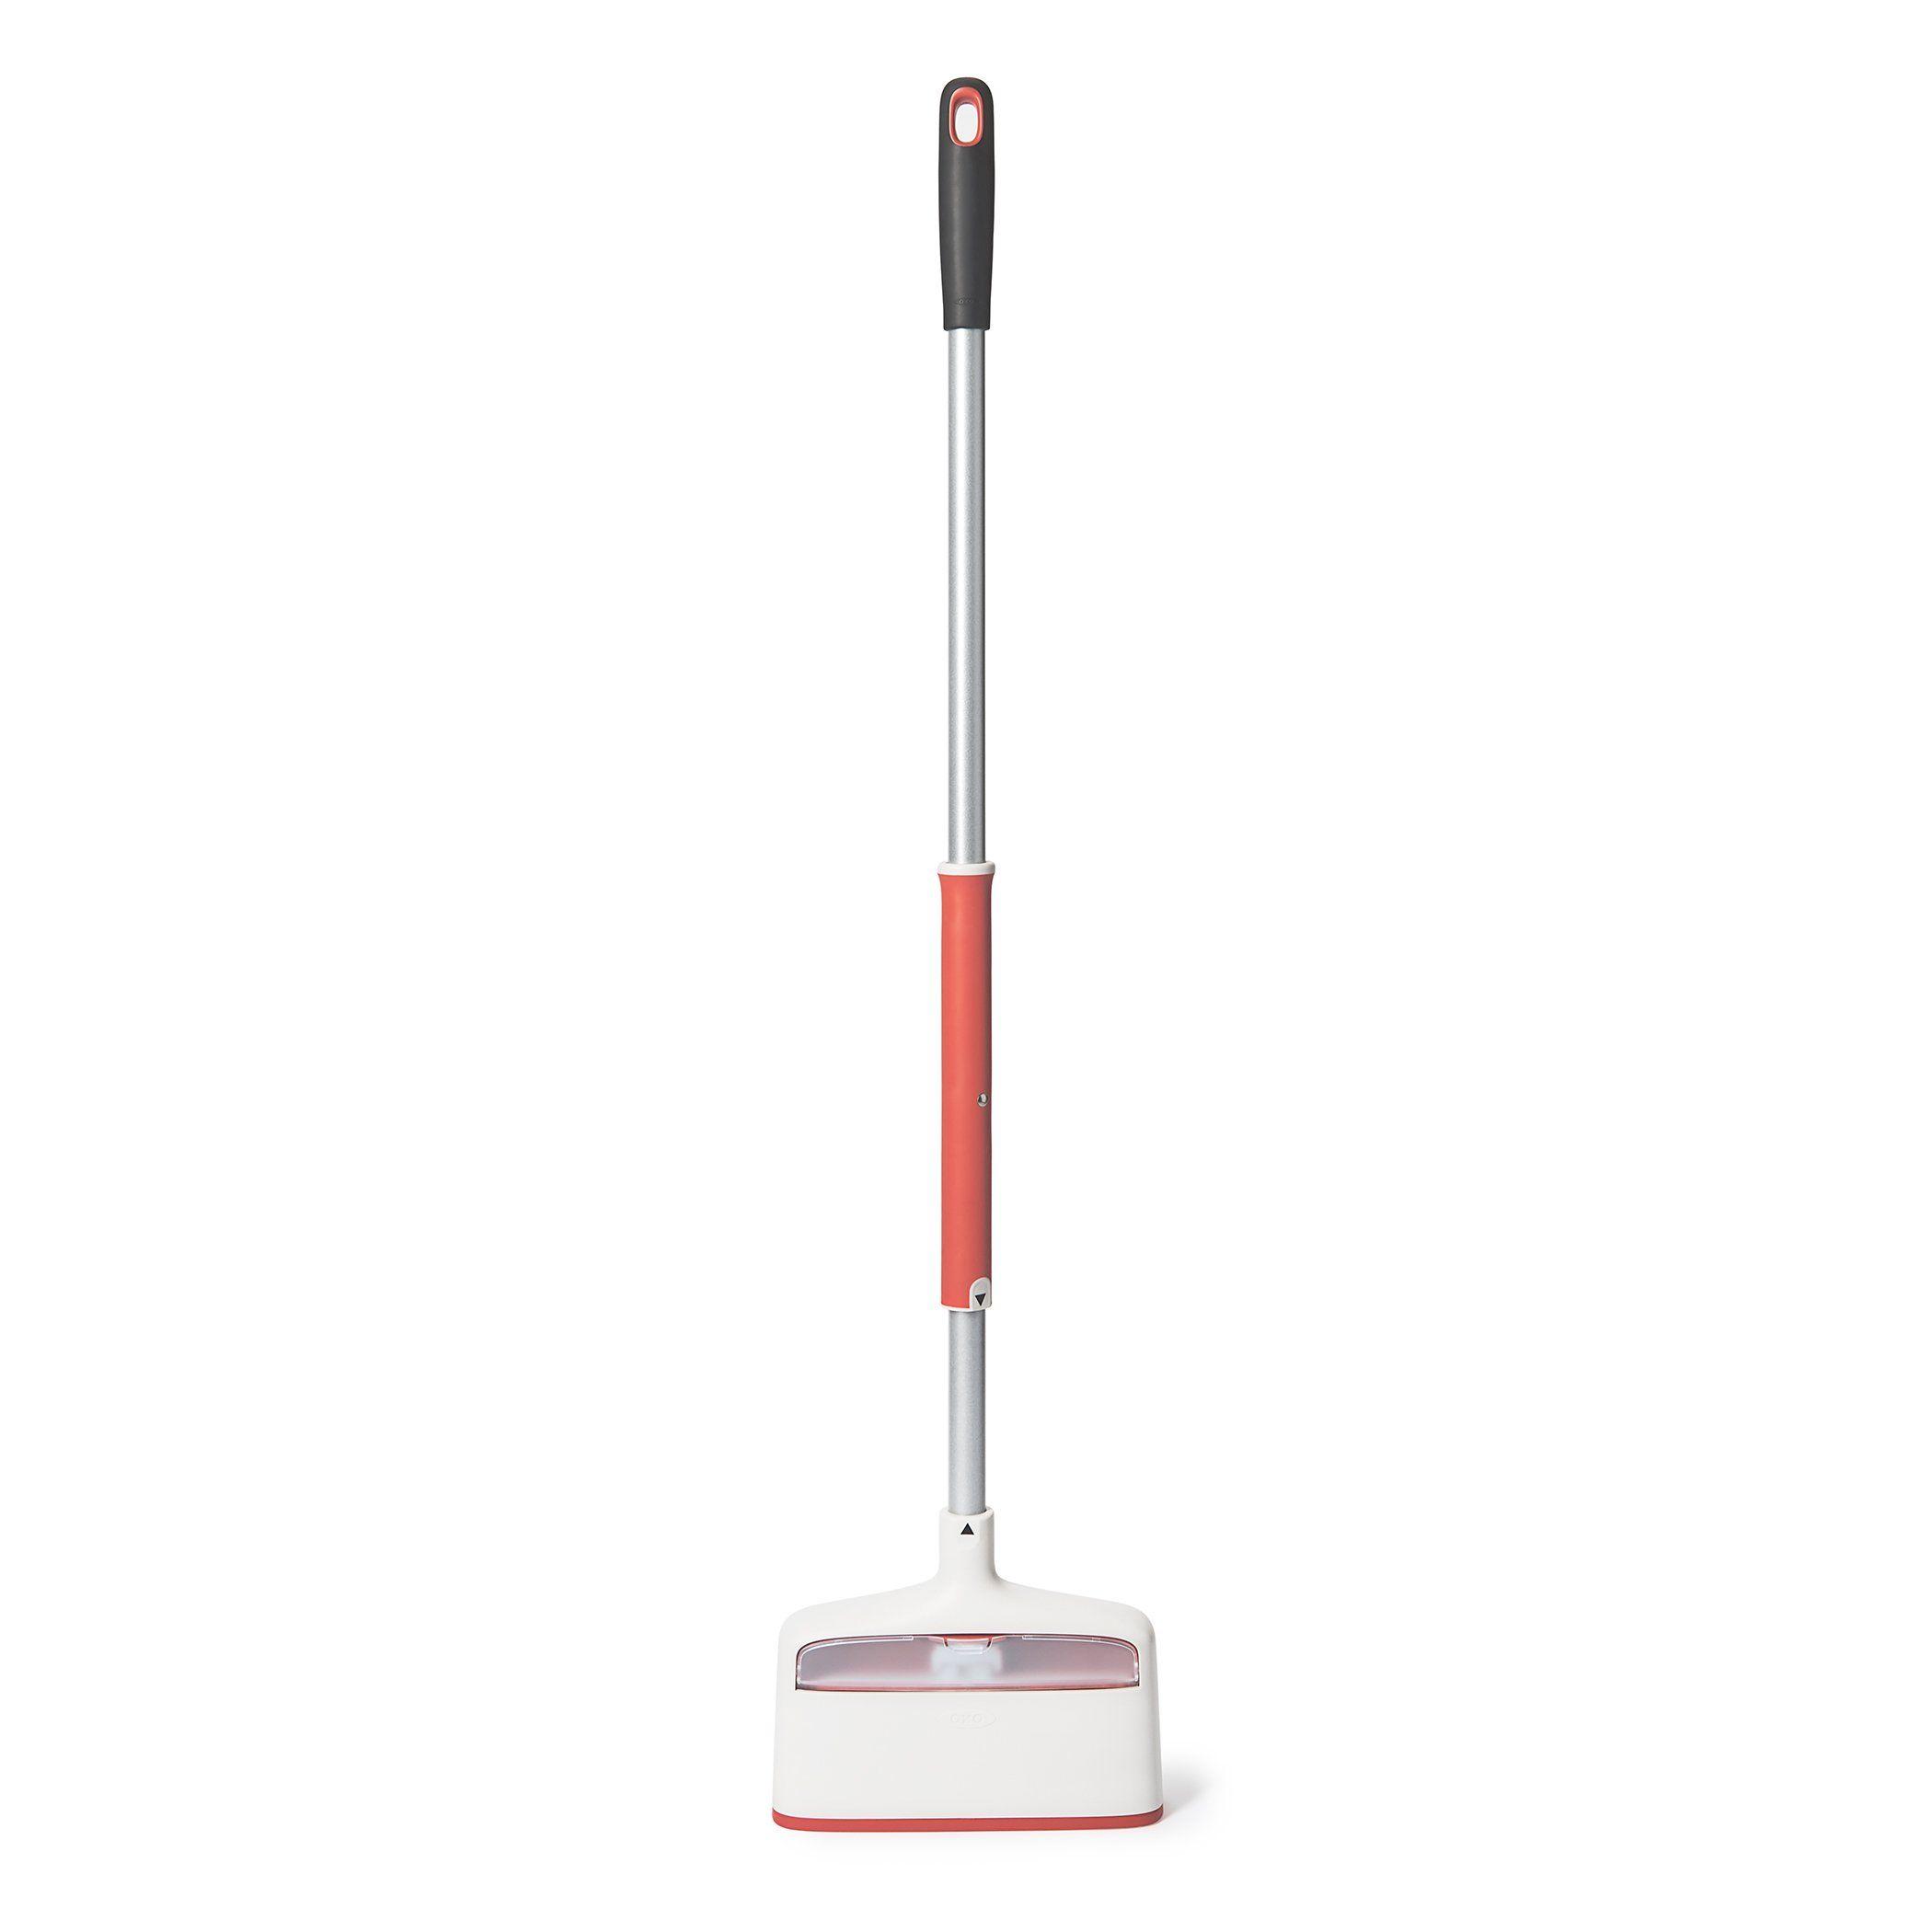 Oxo Good Grips Furlifter Self Cleaning Carpet Rake And Pet Hair